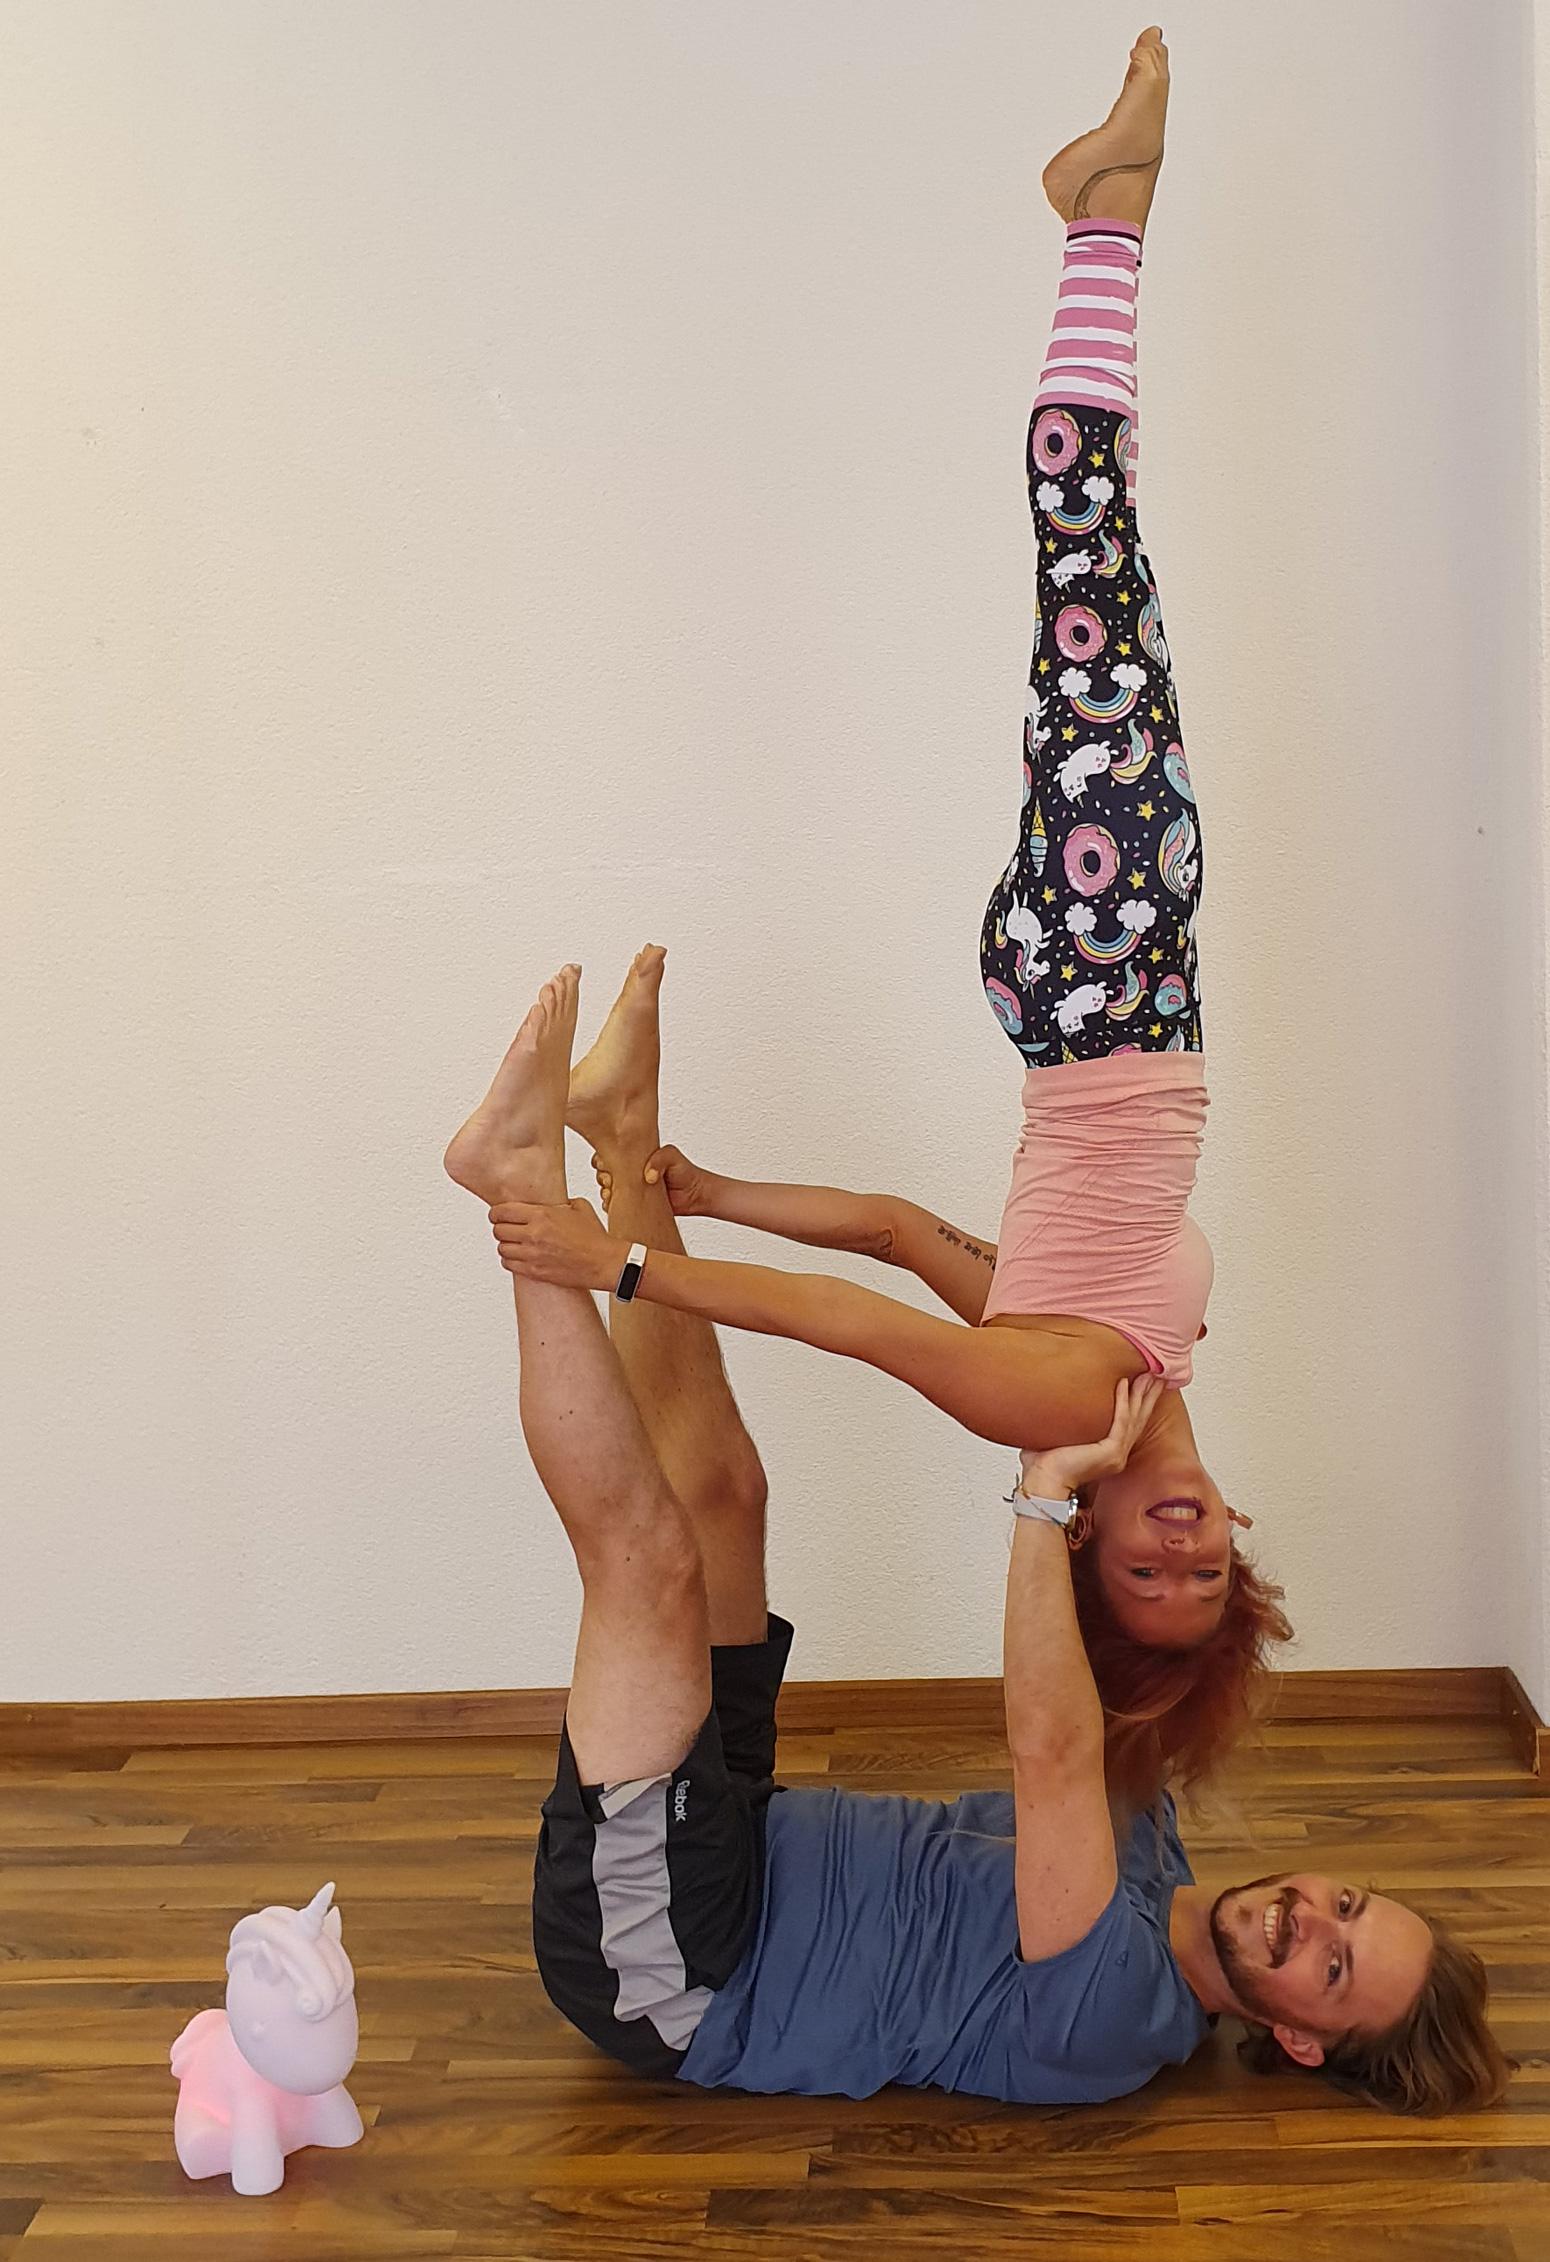 Workshops Partner acro workshop for all levels Mandy Candy's pole dance studio